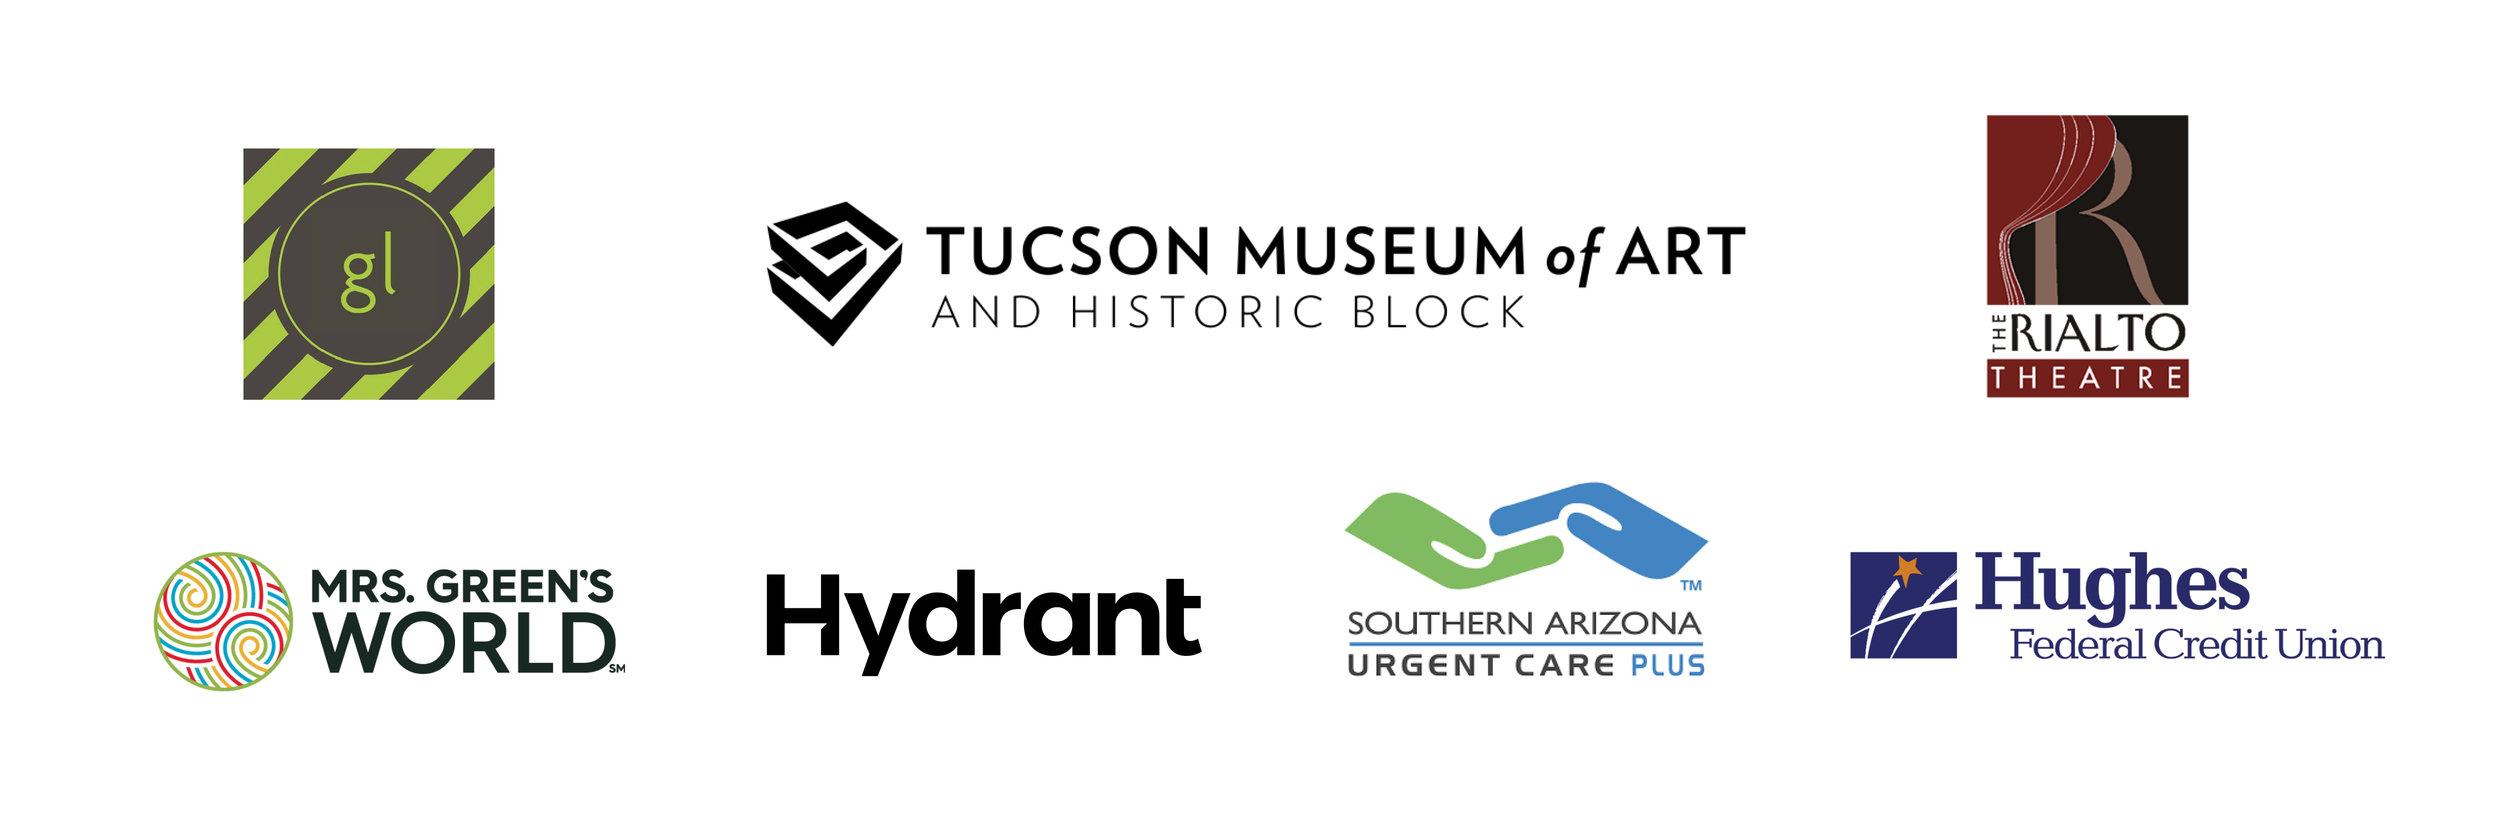 Tucson-LegacyPartners2.jpg